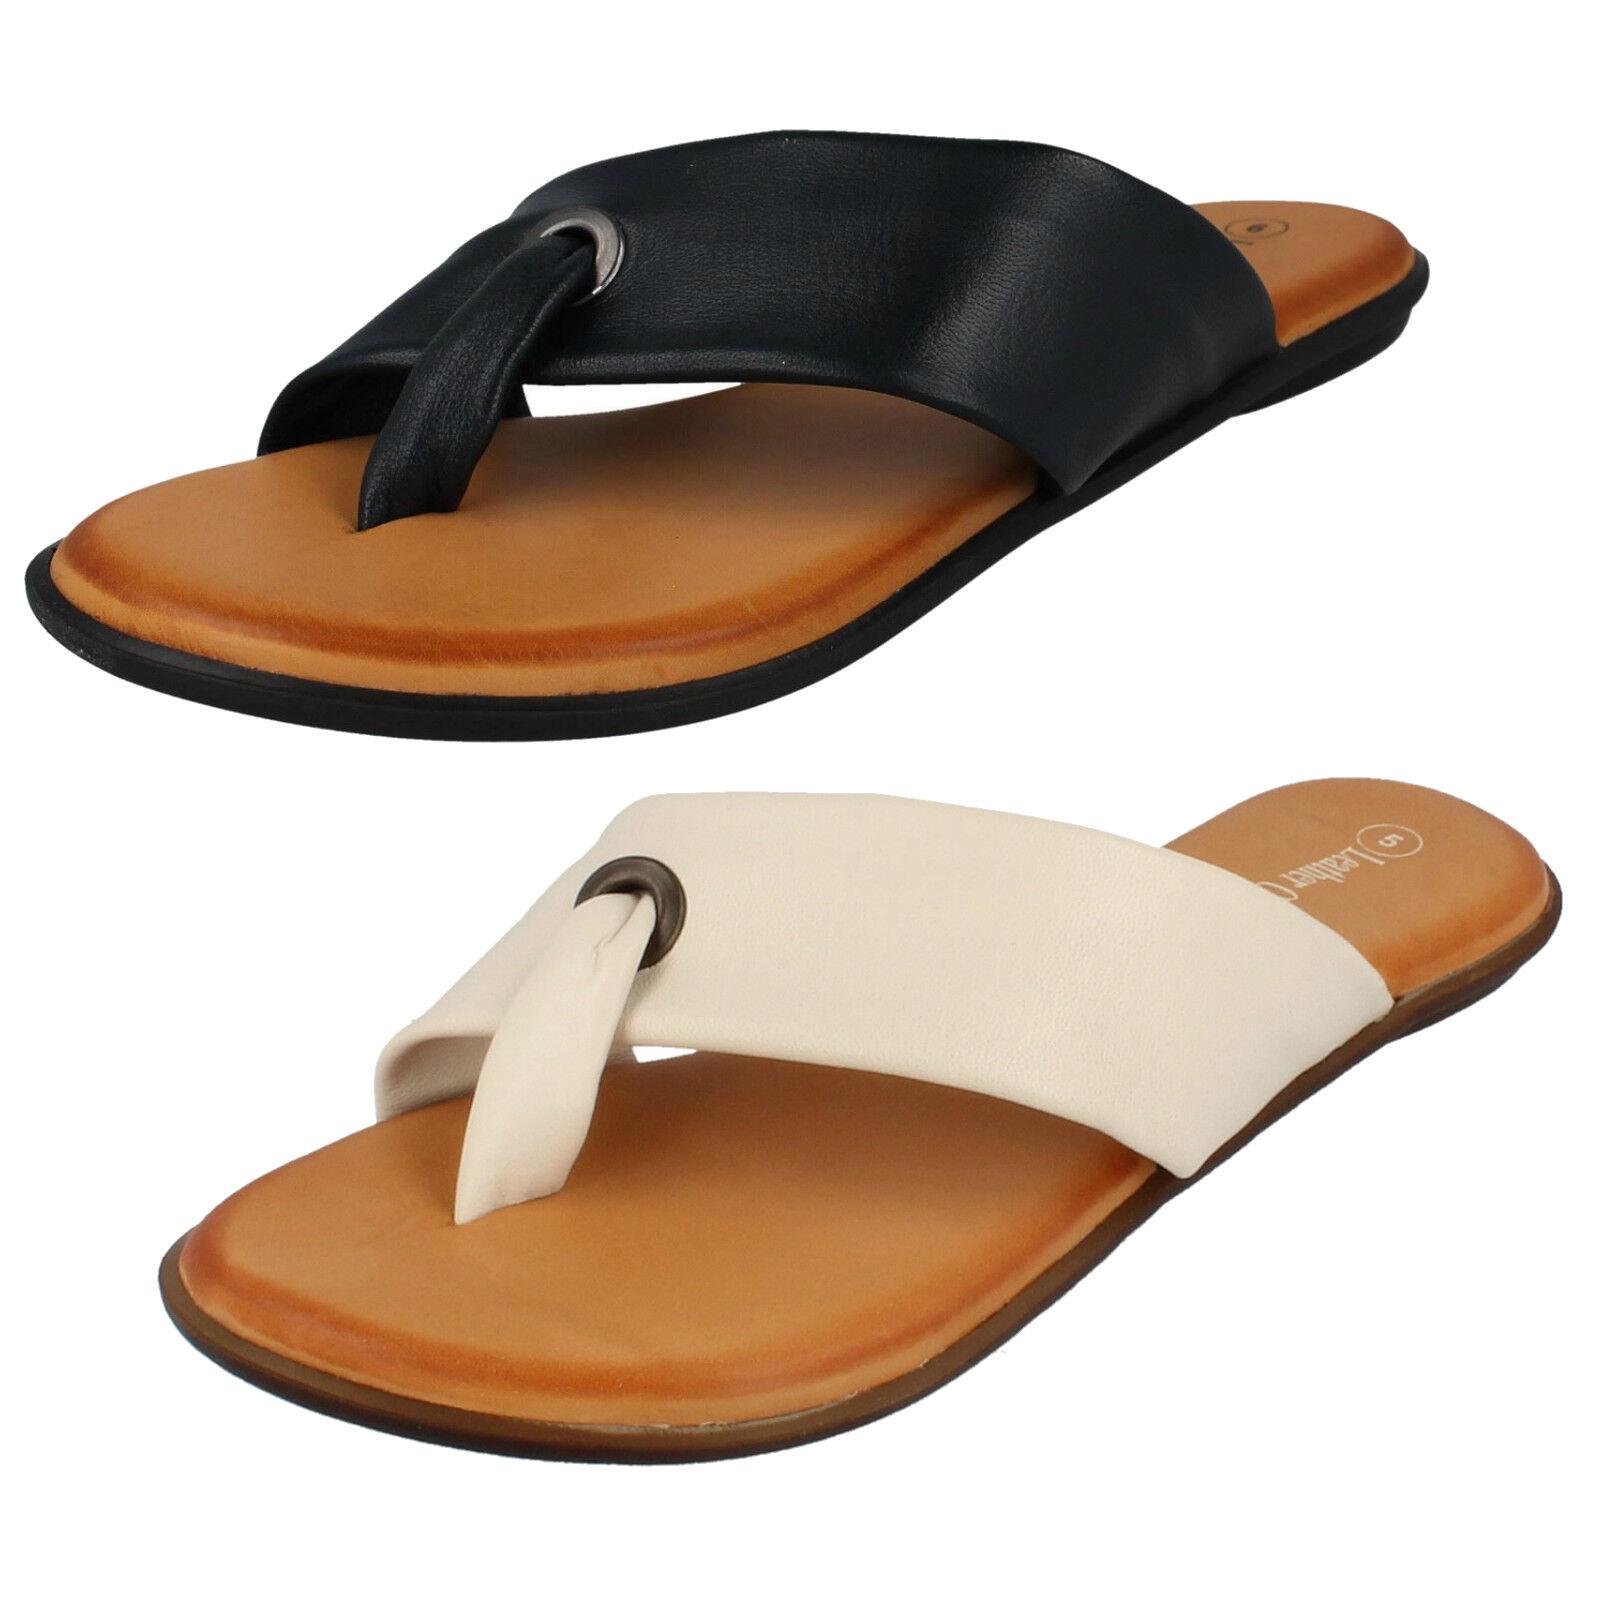 Ladies Post Leather Collection Toe Post Ladies Flip Flop Sandal F0R0147 a3201d